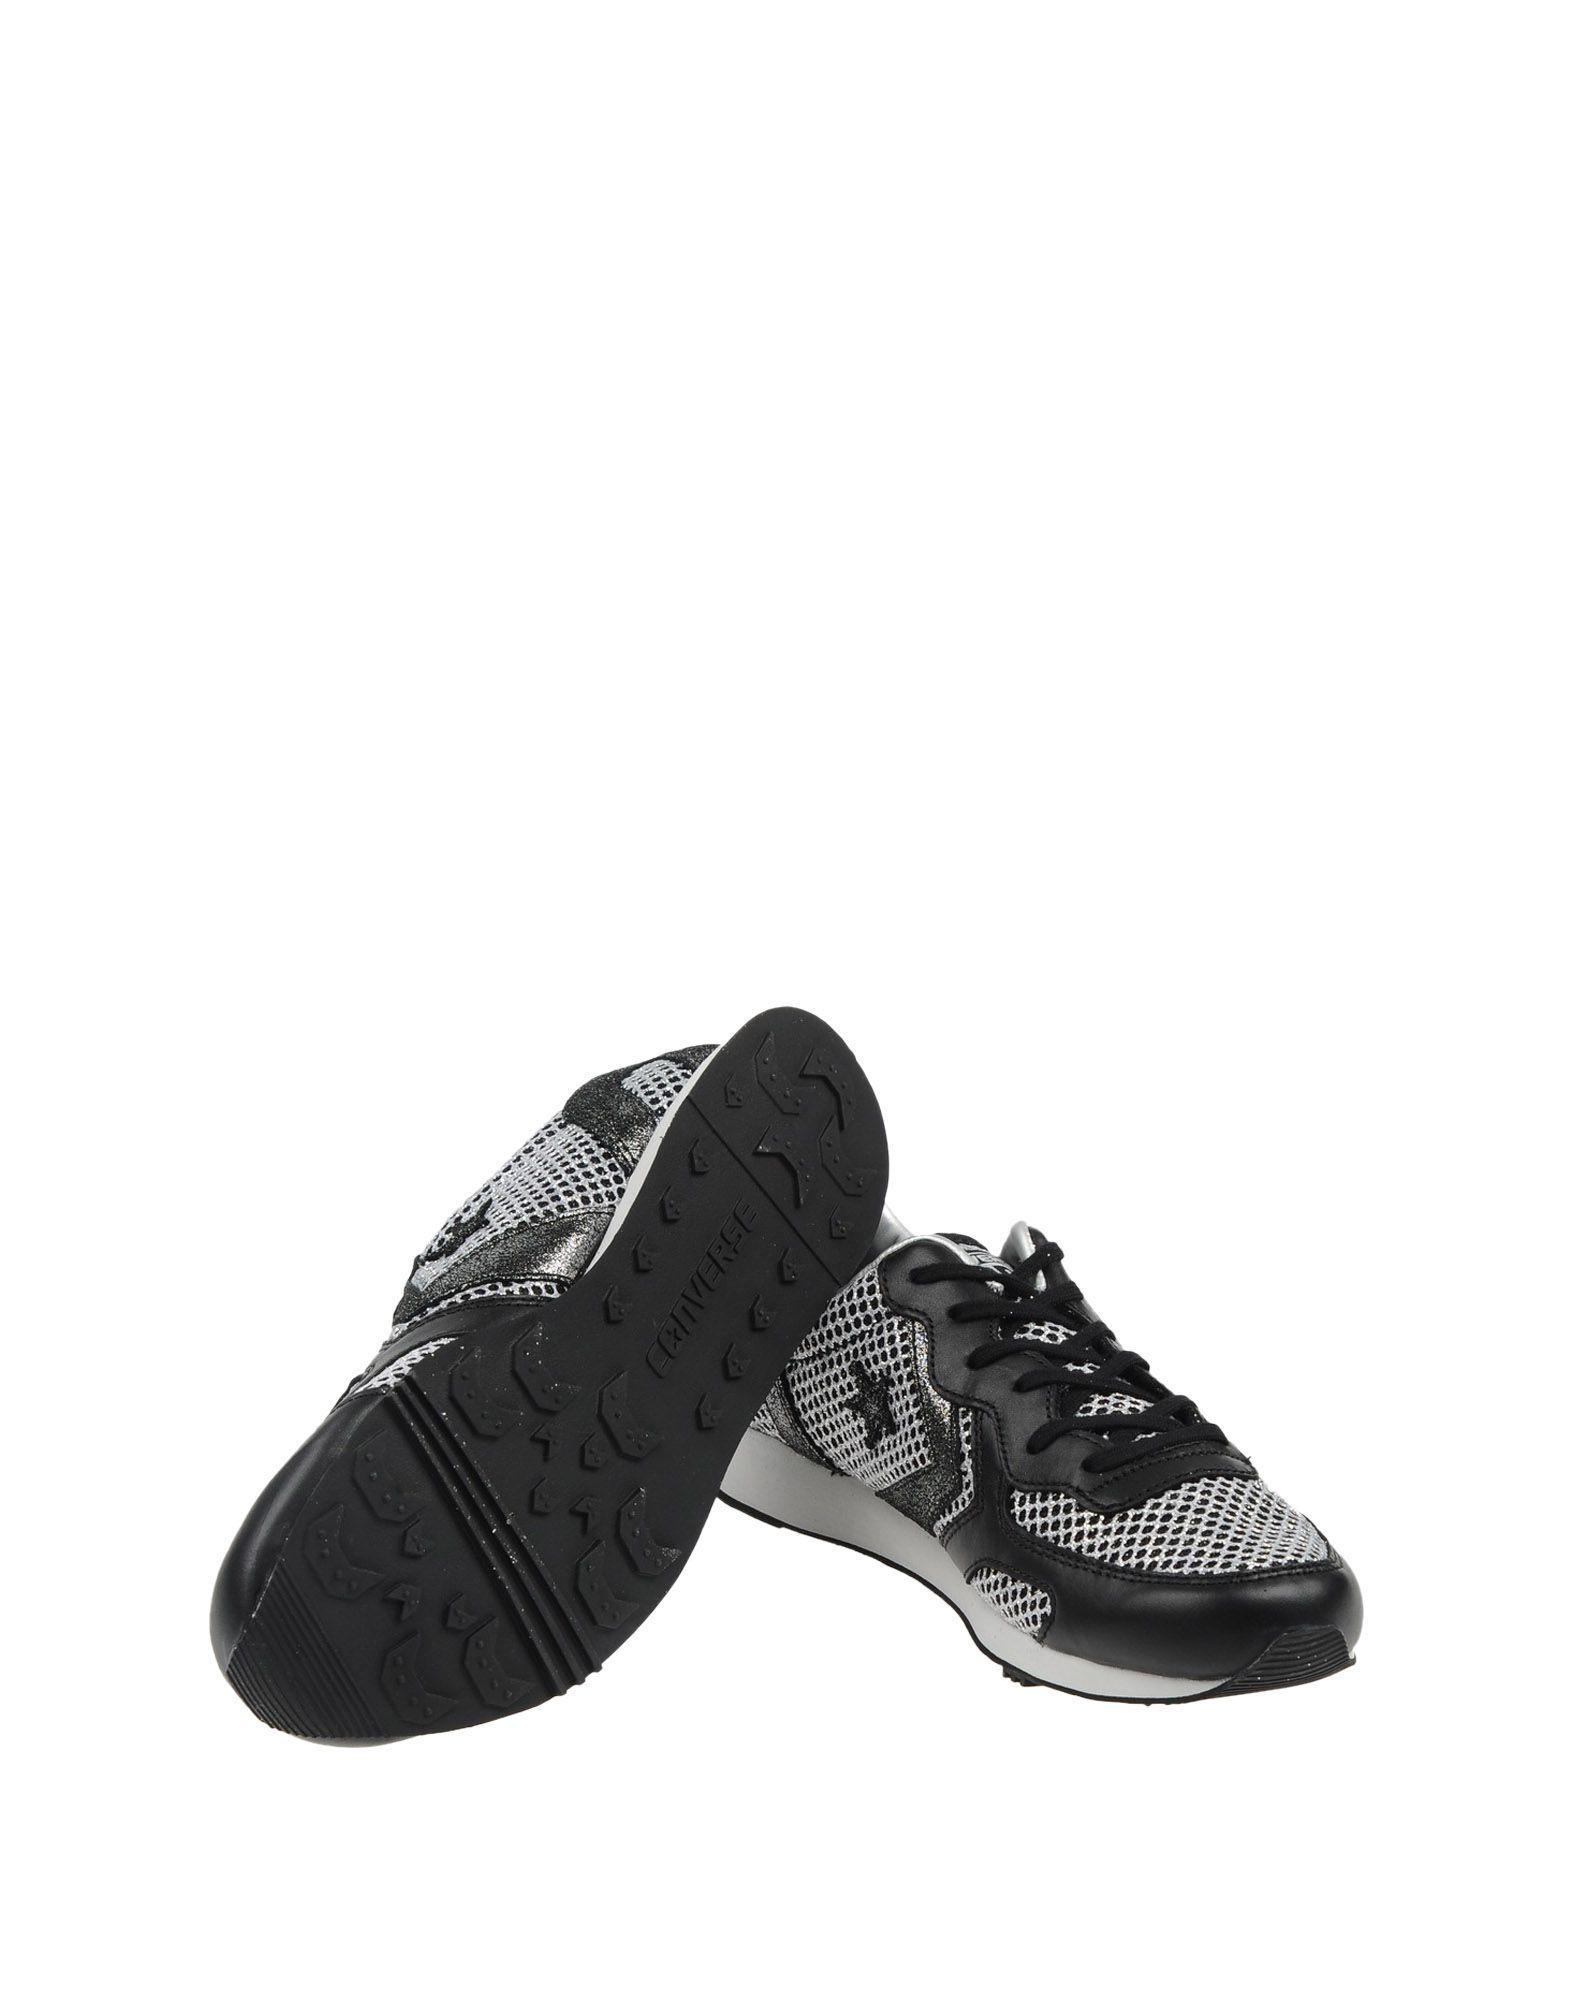 Sneakers Converse Cons Auckland Racer Ox Gli Mesh/Lea - Femme - Sneakers Converse Cons sur